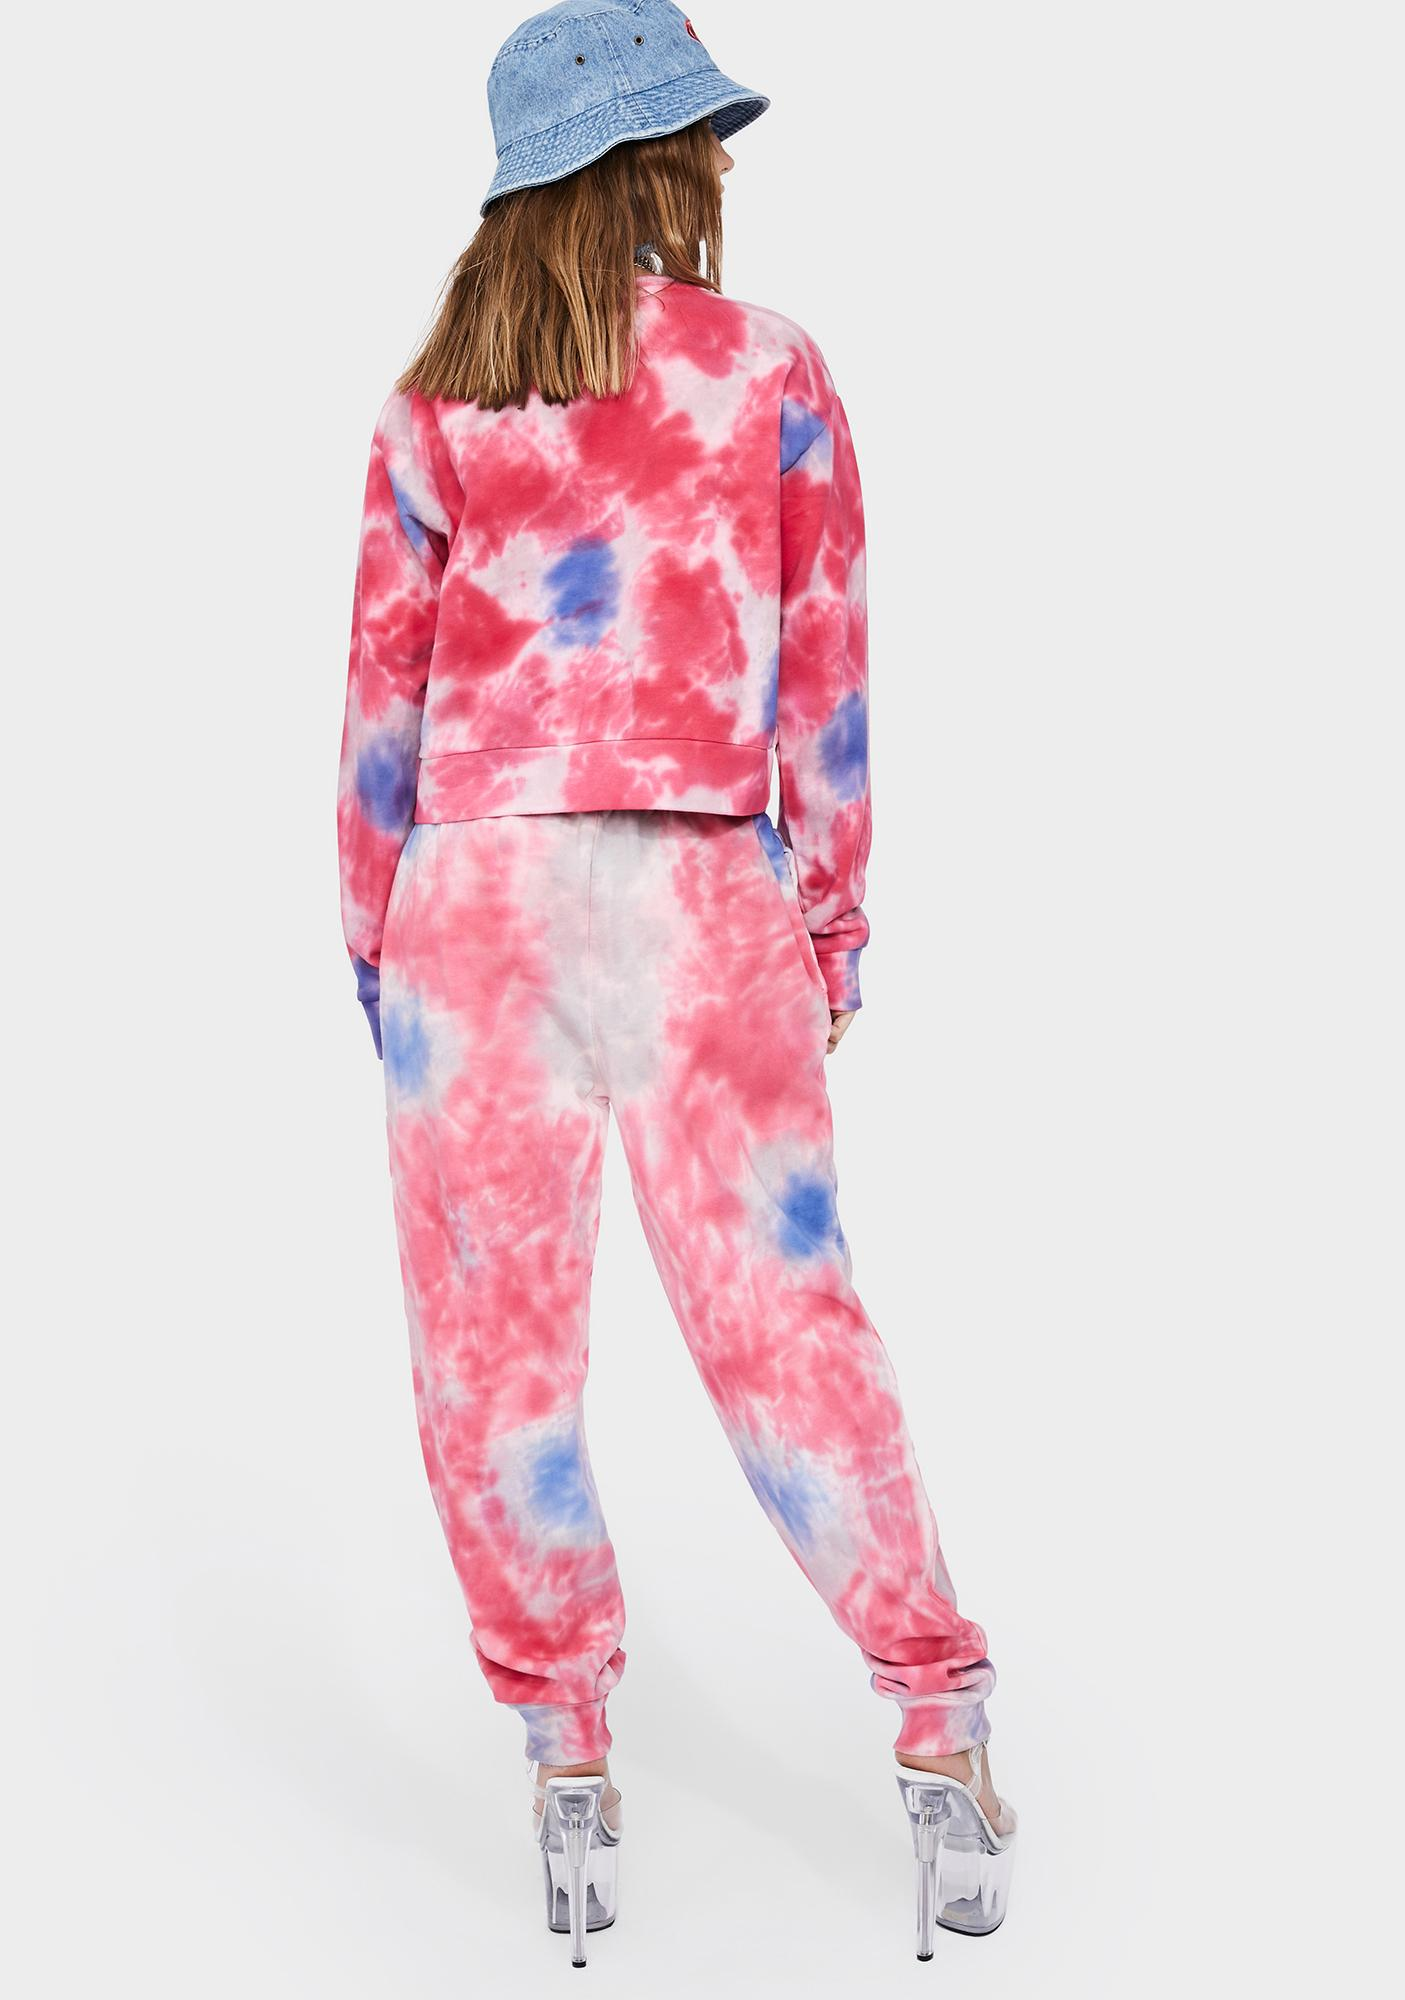 Kappa Pink Authentic Camda Tie Dye Sweatpants